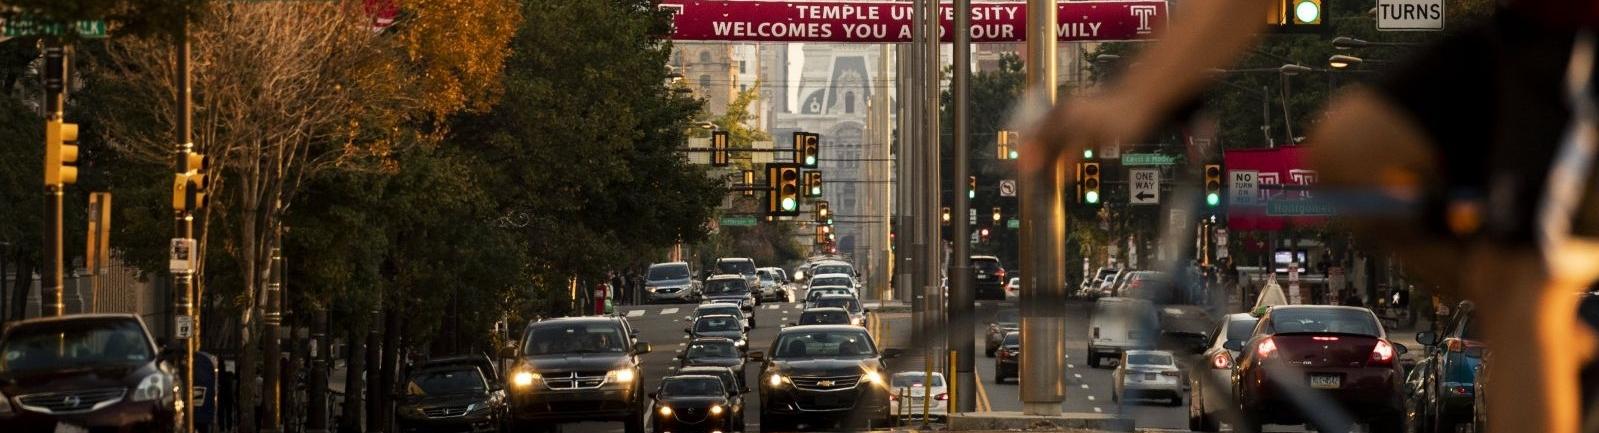 A Temple University banner flies above Broad Street in Philadelphia.